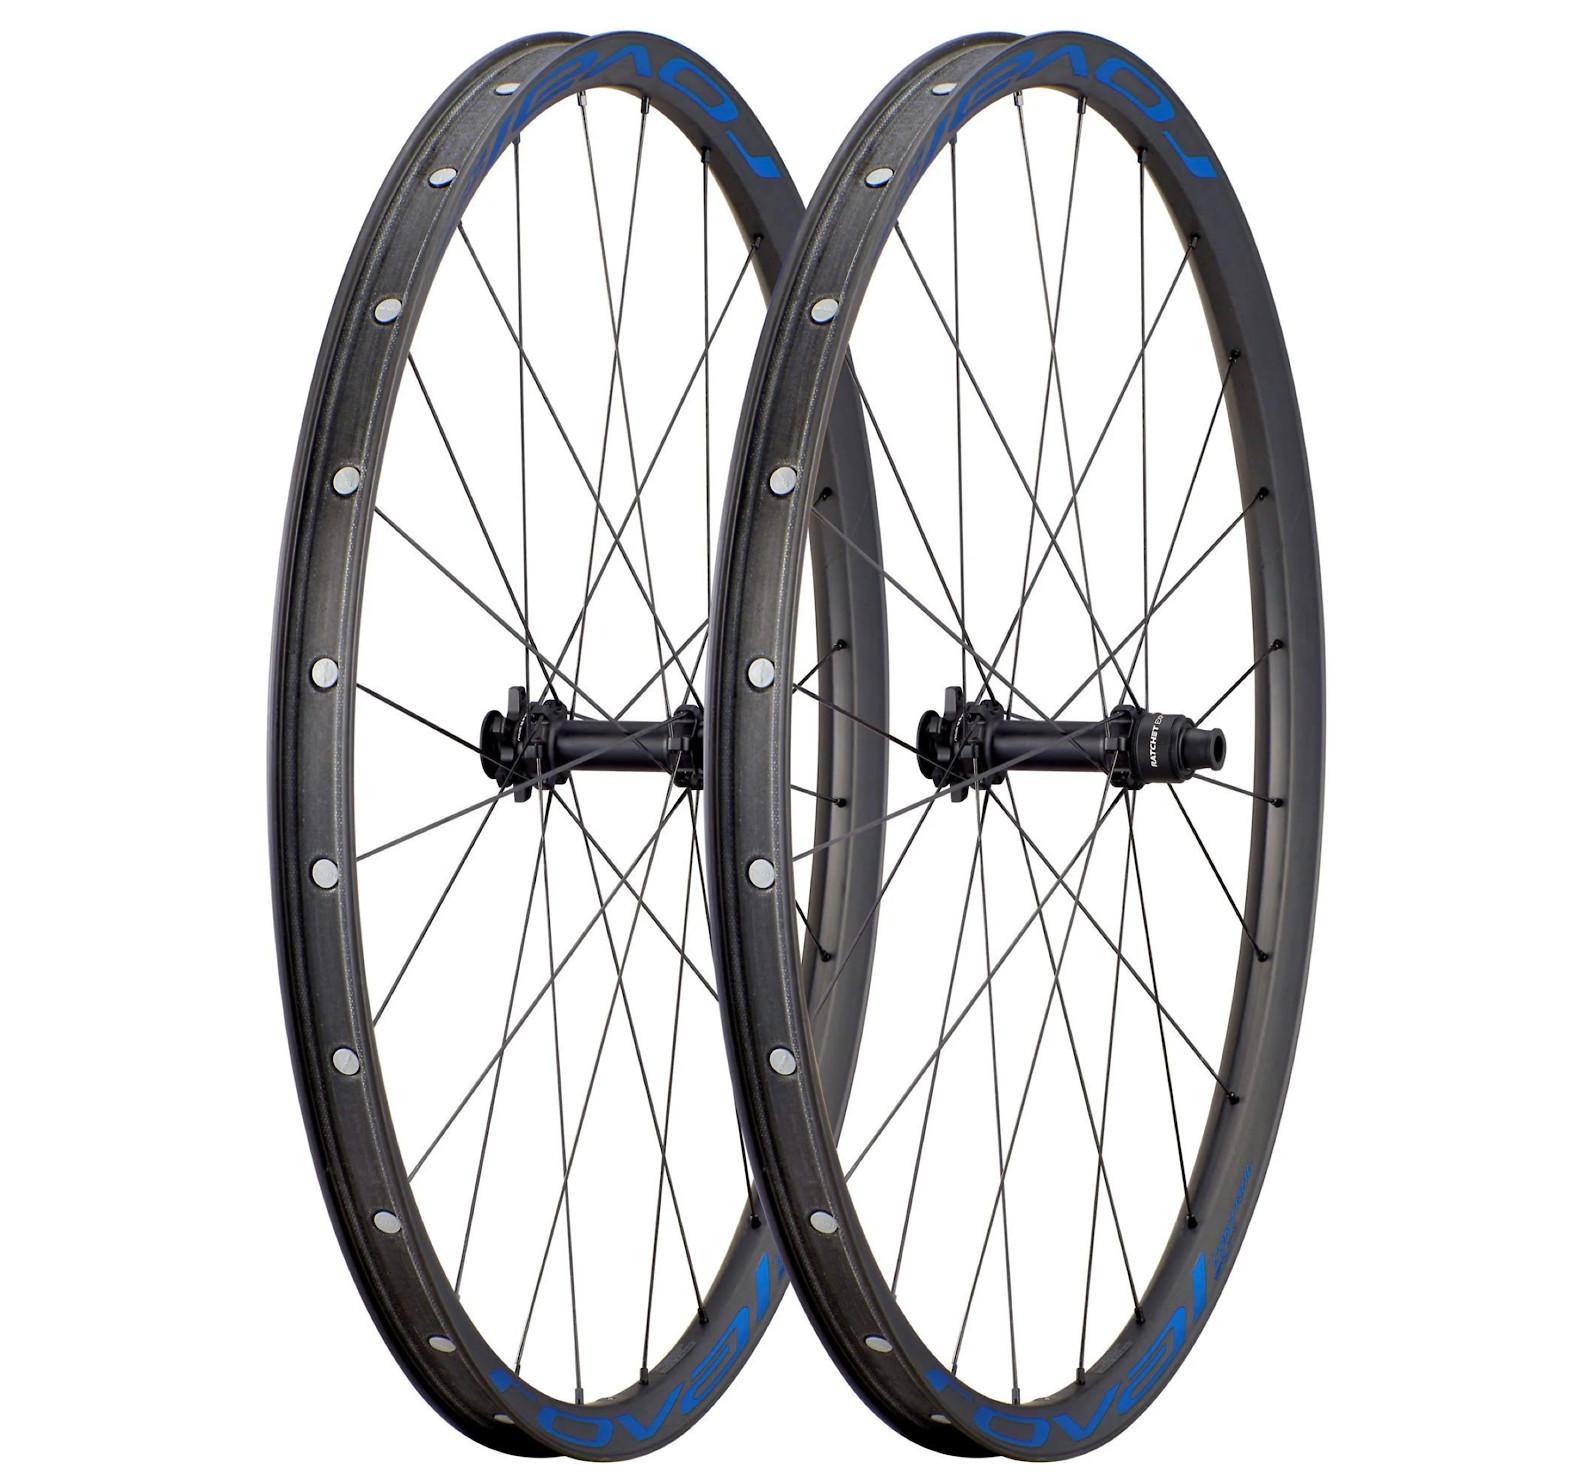 Roval Control SL Team LTD Wheelset